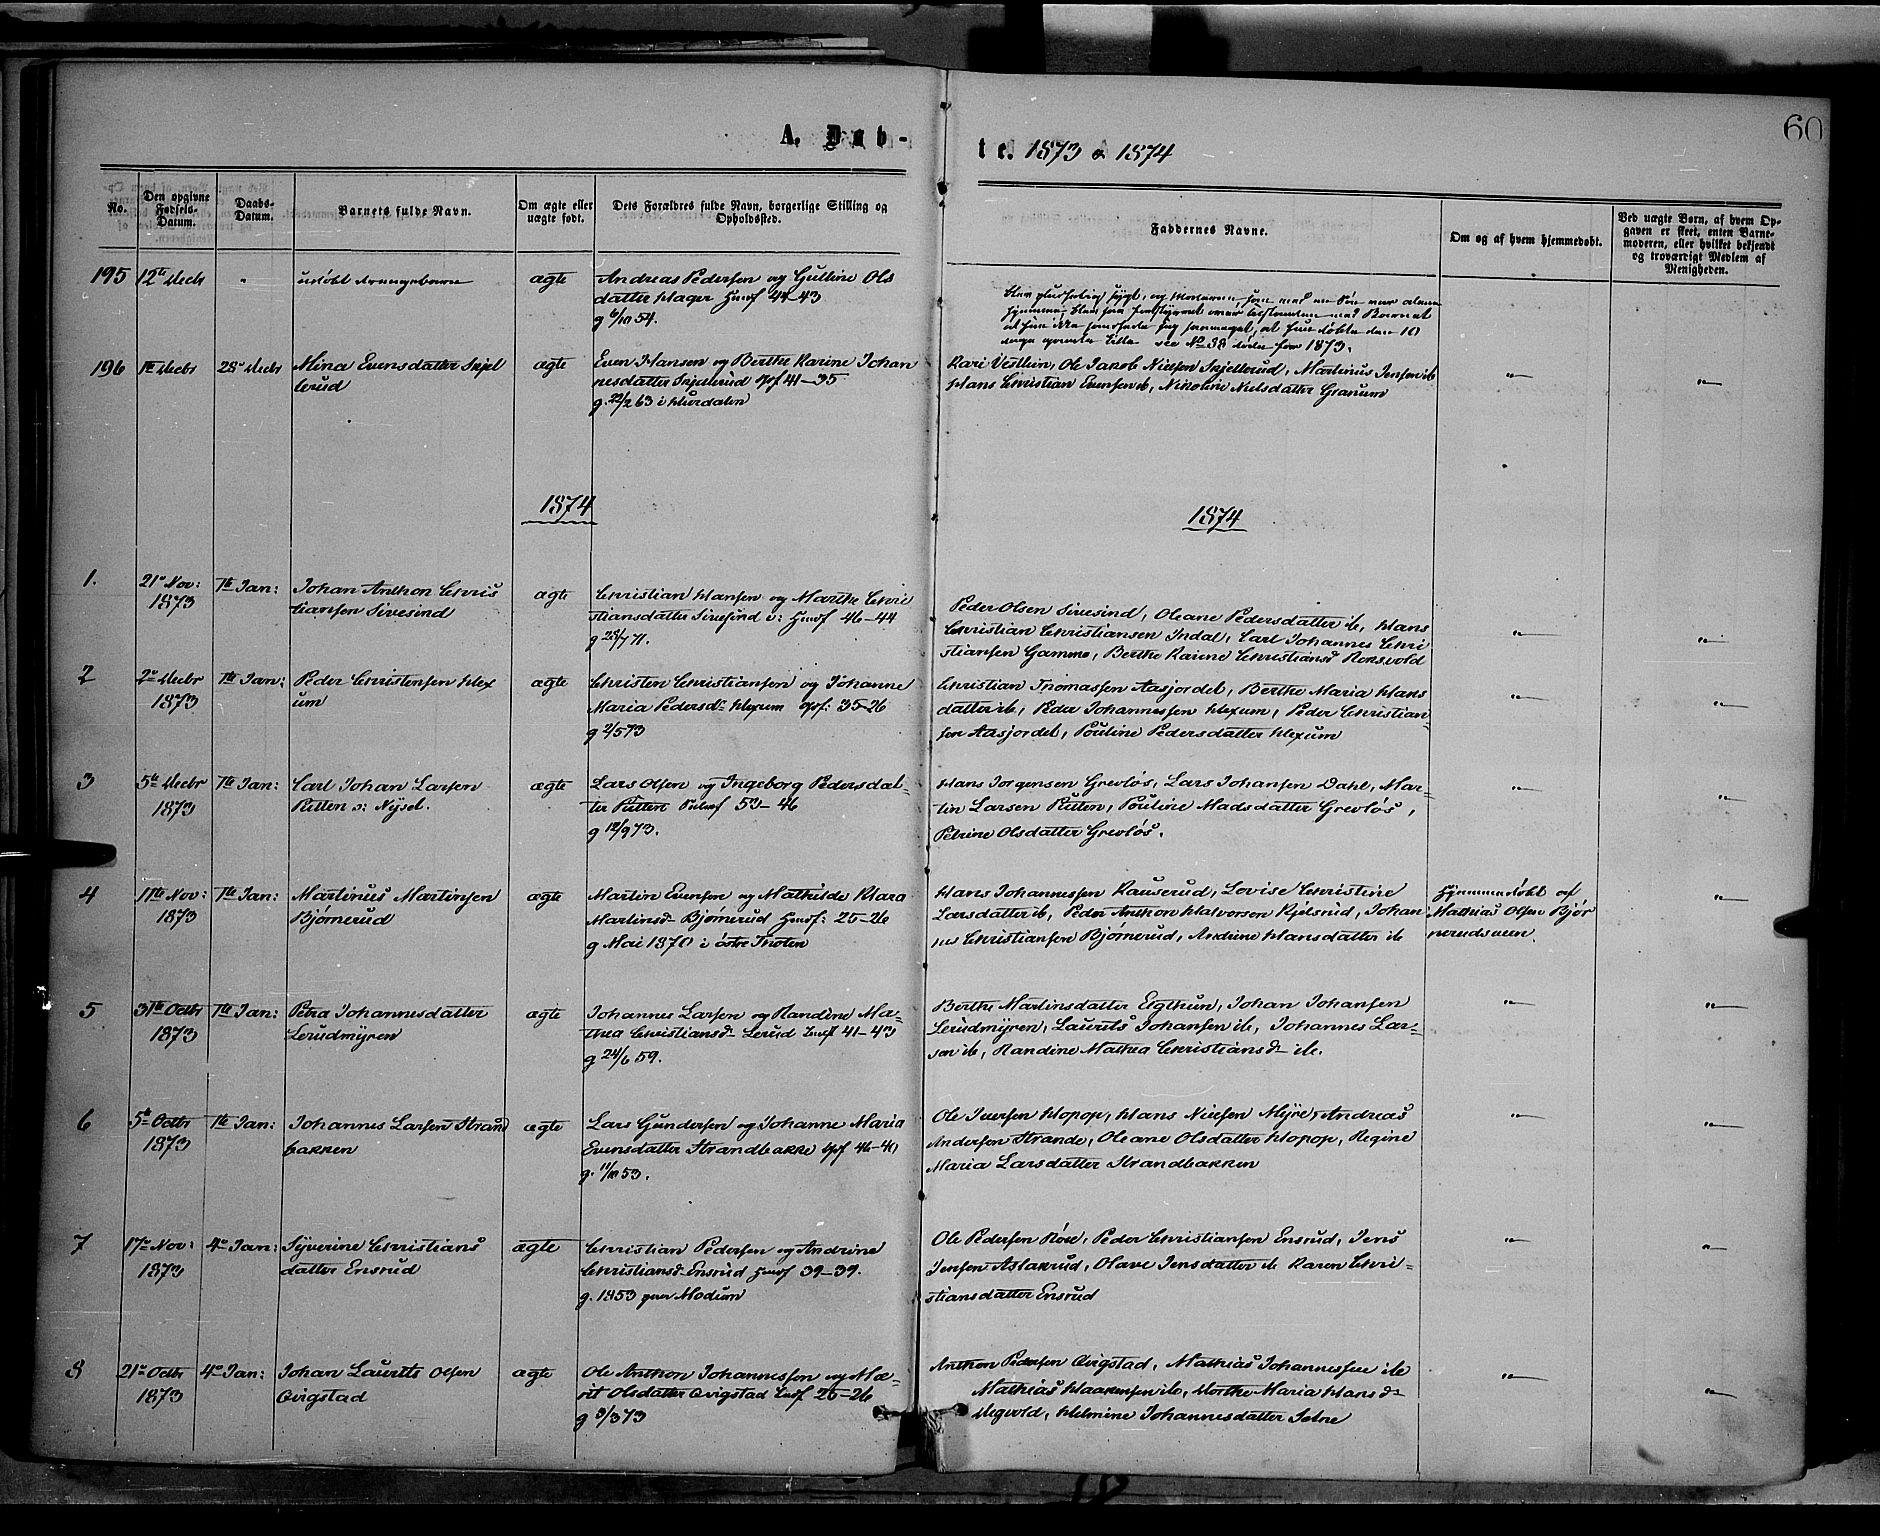 SAH, Vestre Toten prestekontor, H/Ha/Haa/L0008: Ministerialbok nr. 8, 1870-1877, s. 60